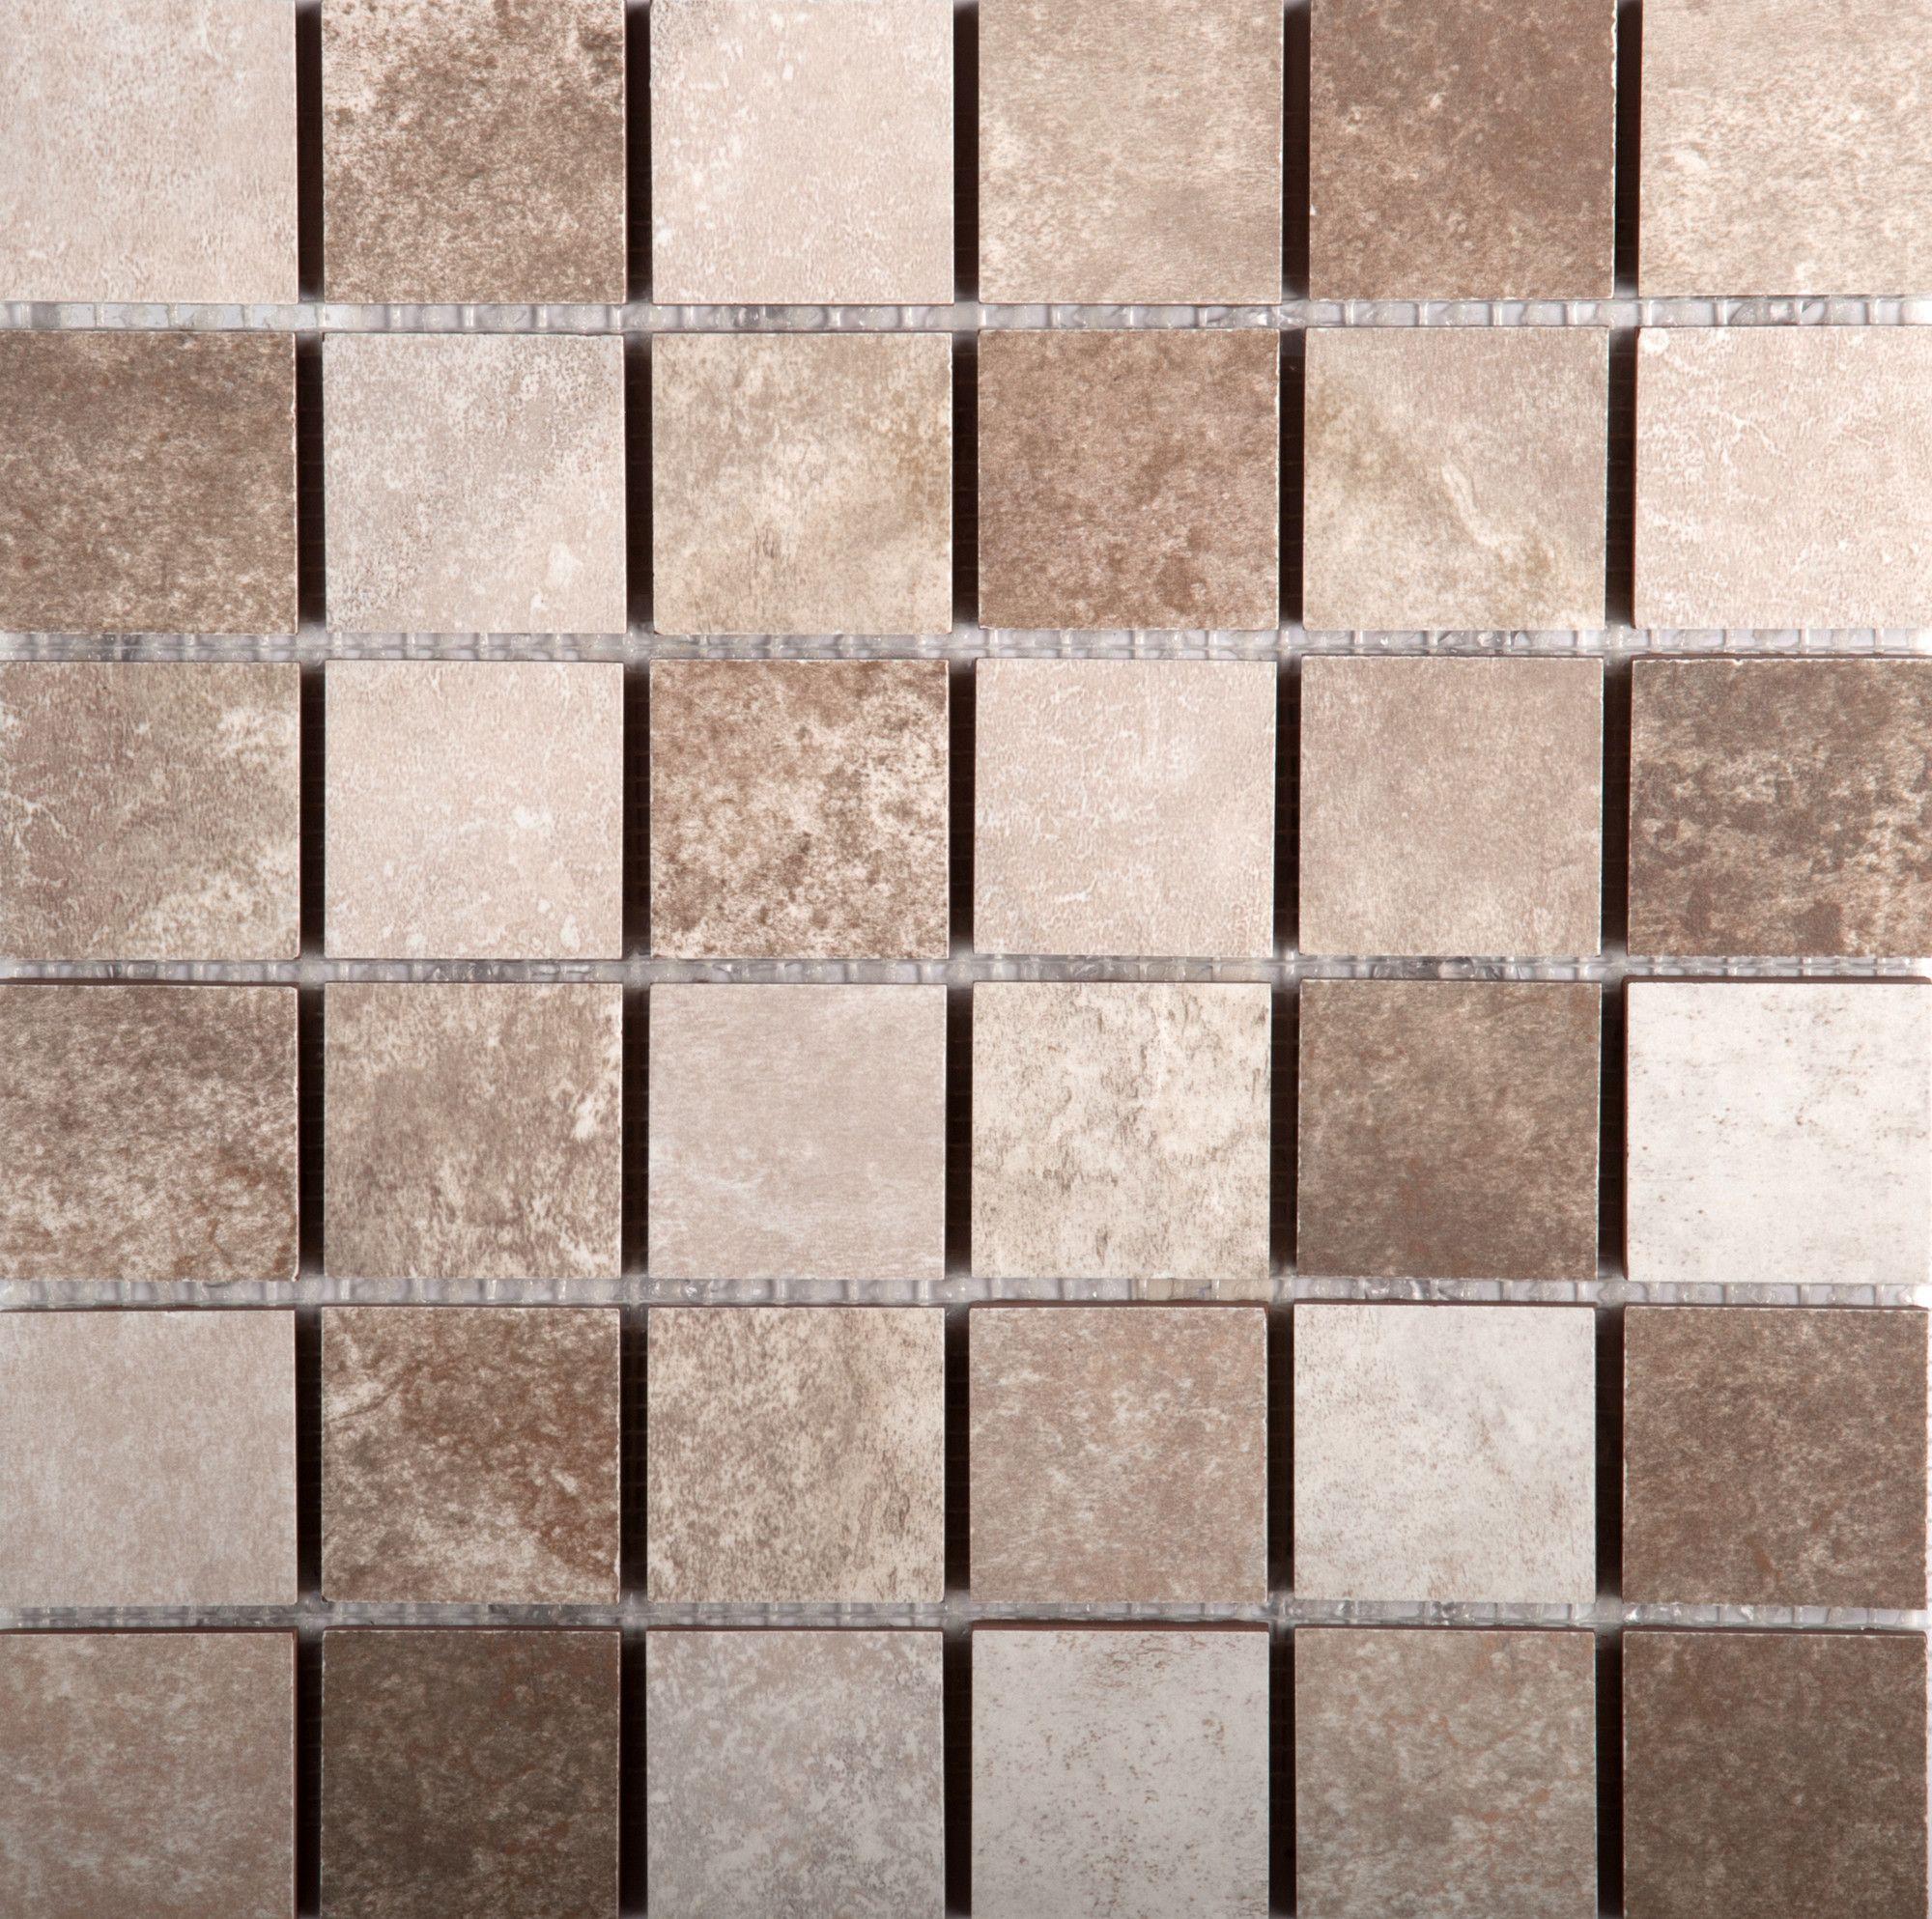 Ceramic tiles bristol sportparts bristol 2 x 13 ceramic tile in summer pd32 h doublecrazyfo Image collections